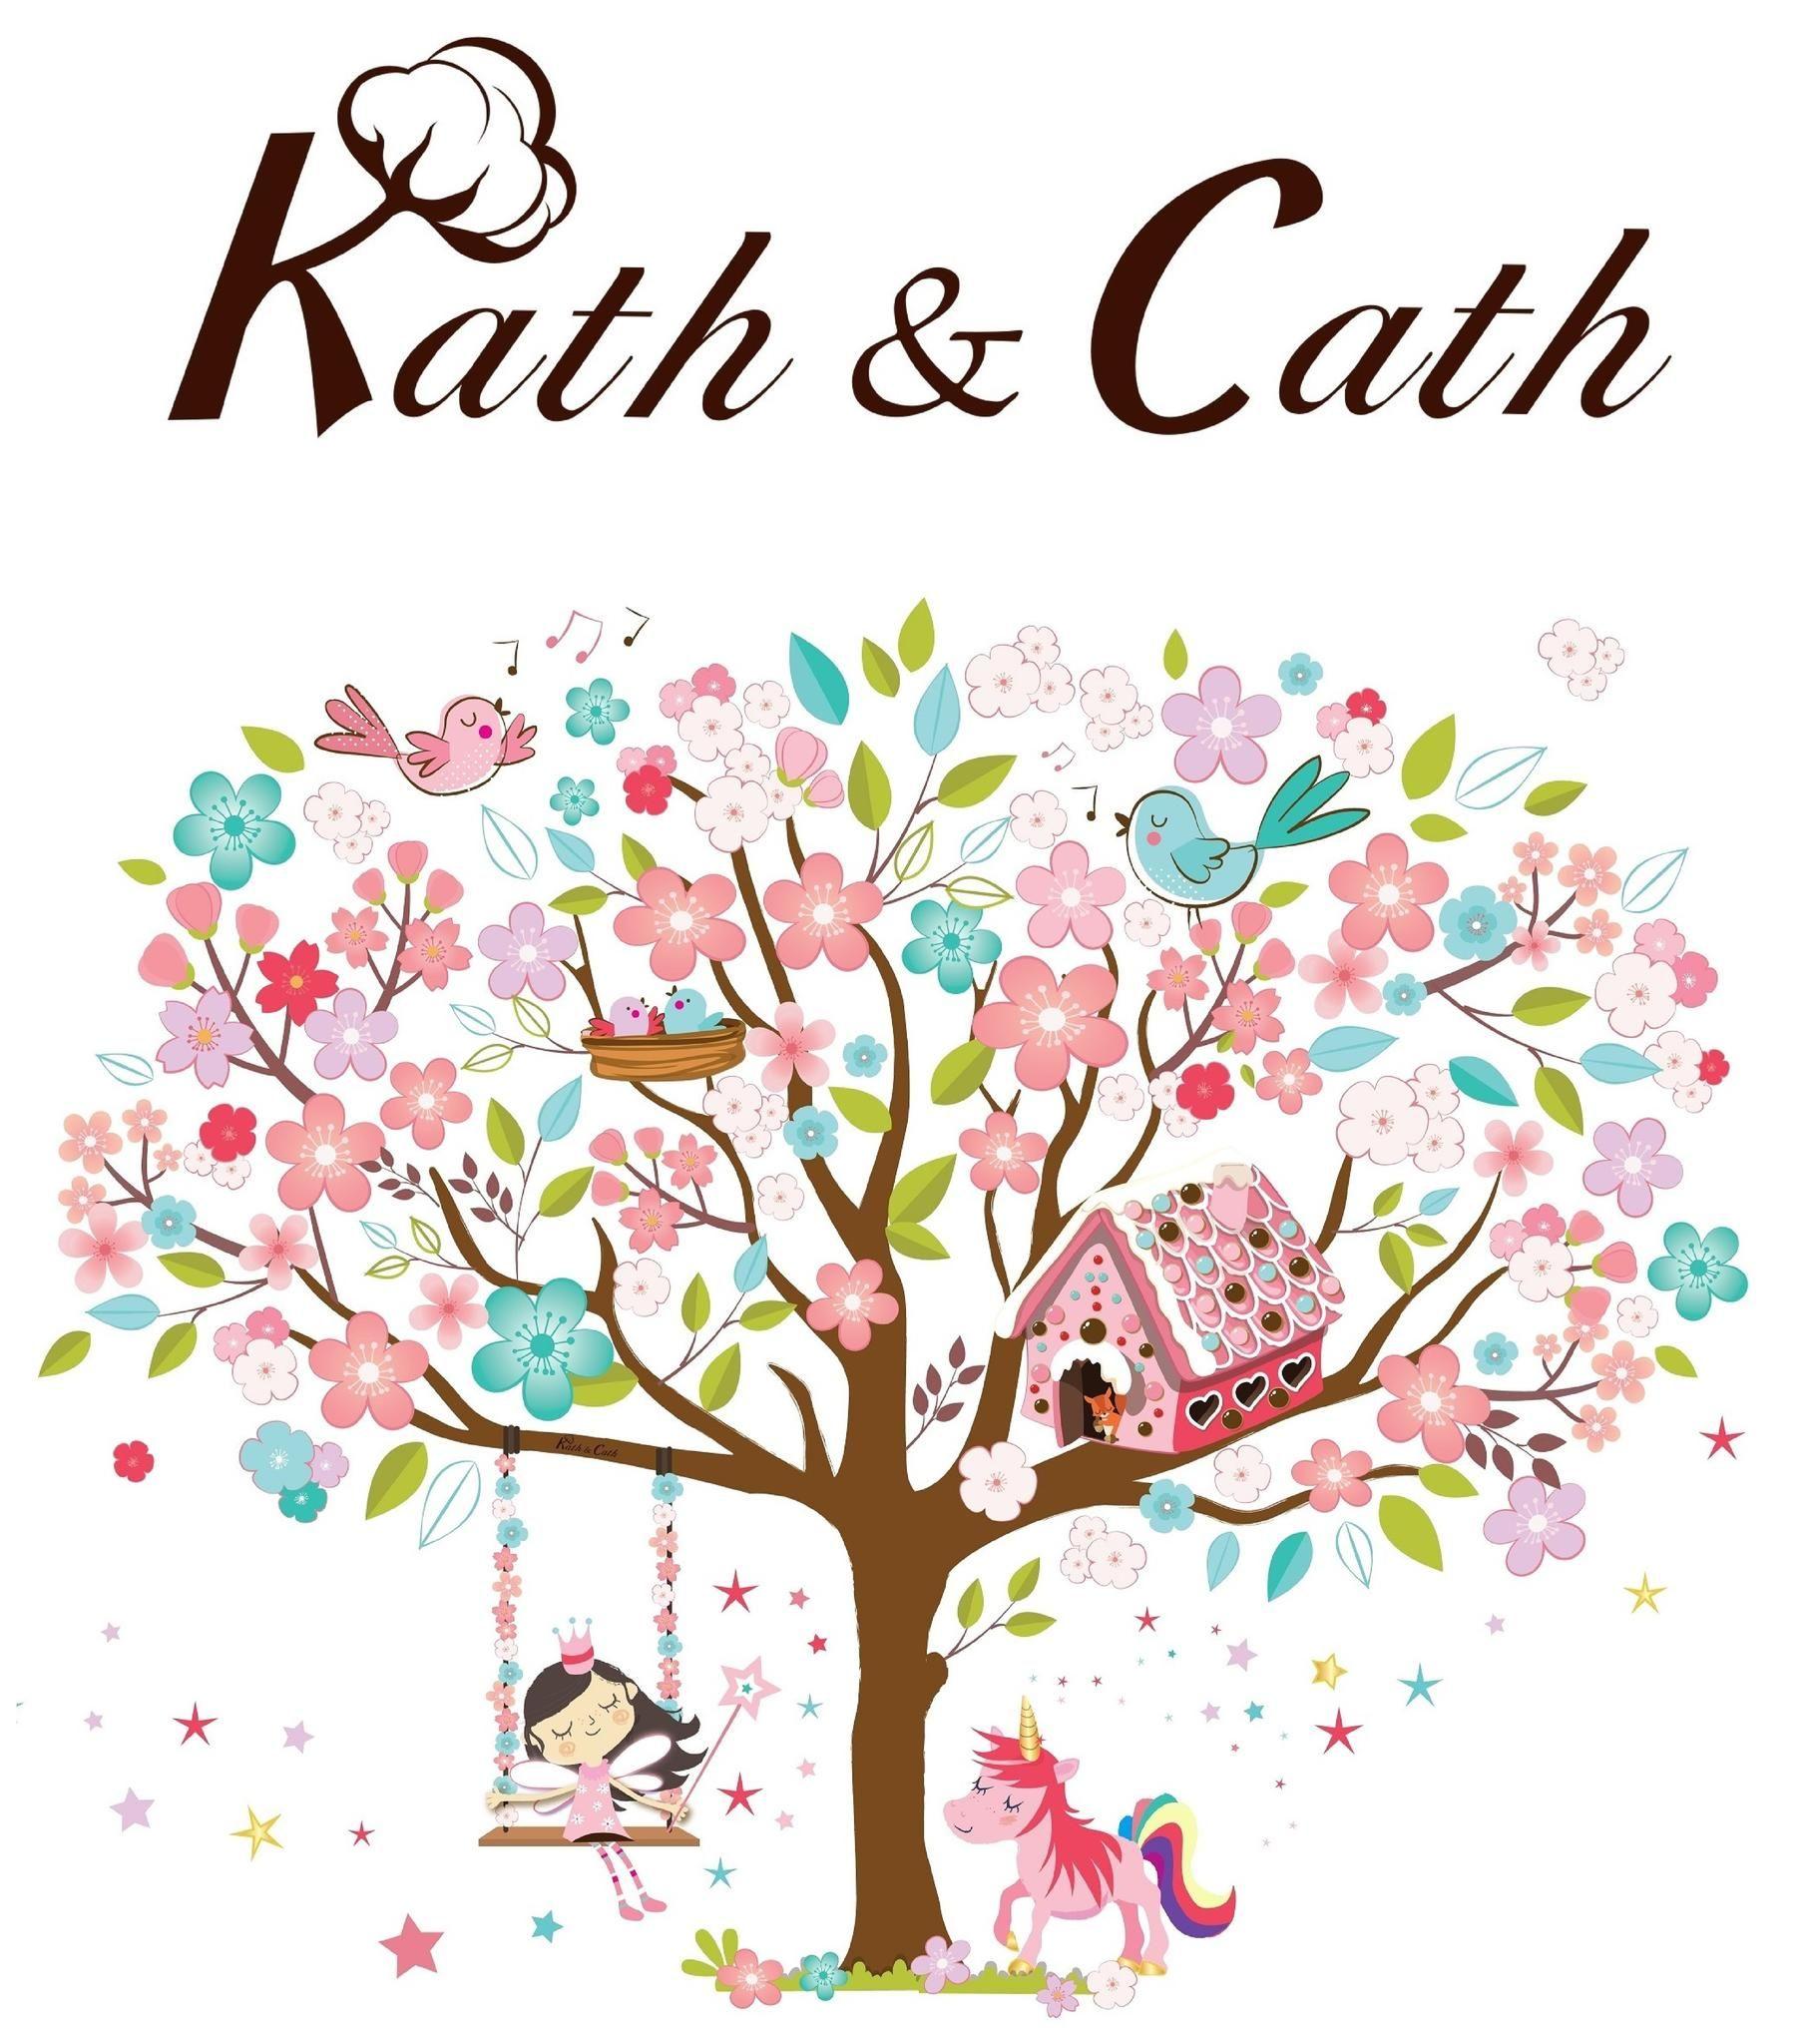 Kath & Cath Ltd